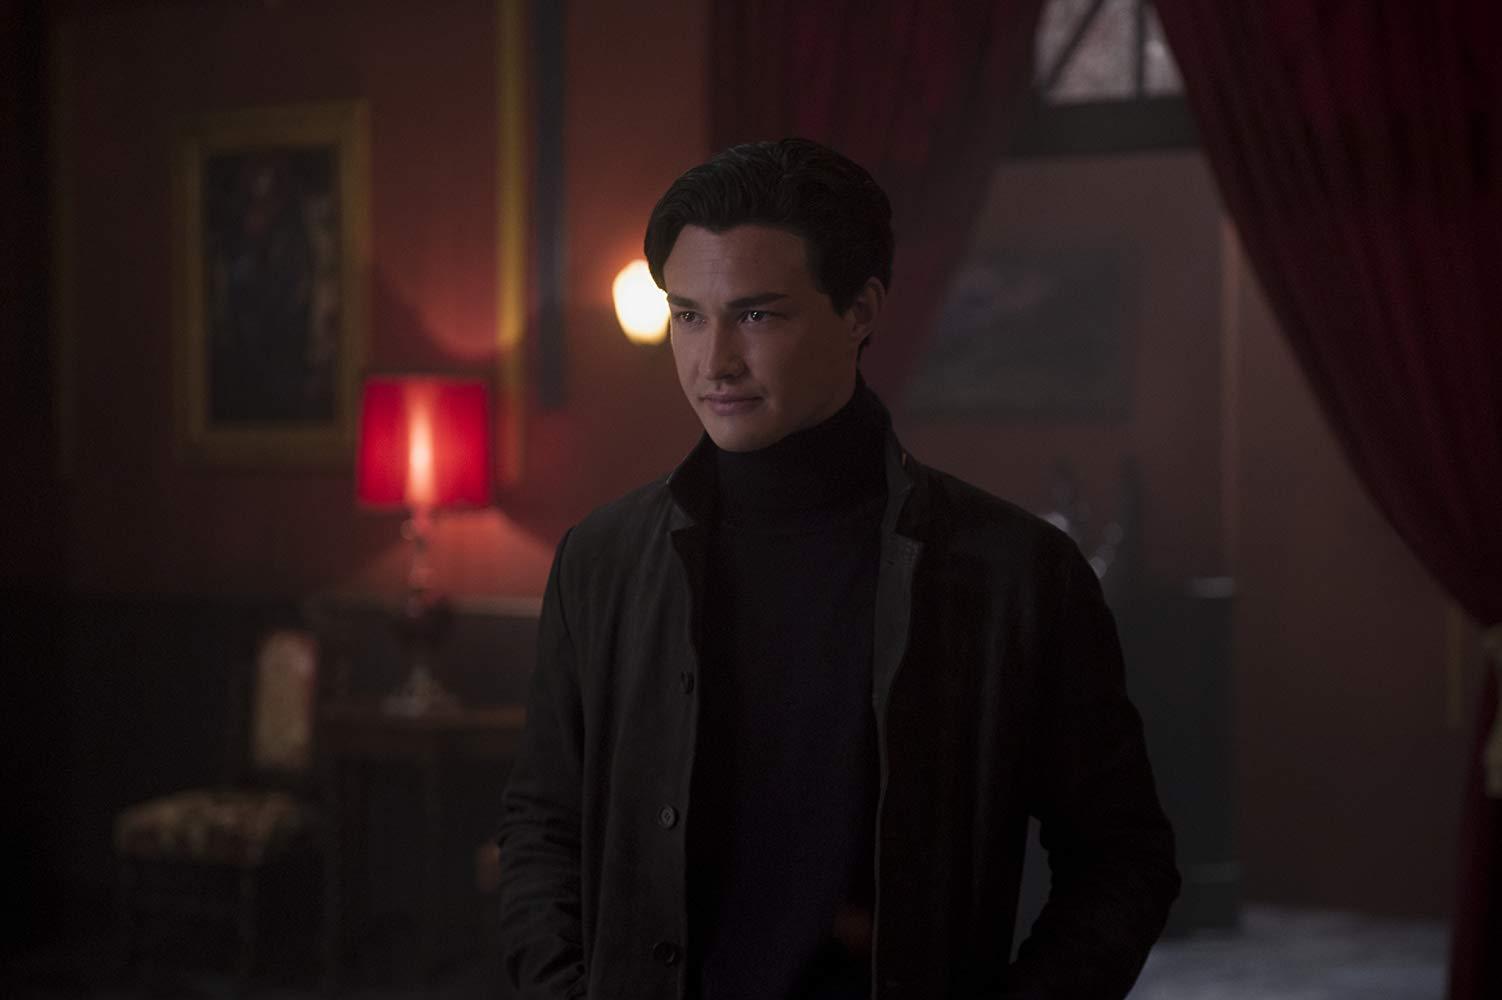 Le terrificanti avventure di Sabrina: Gavin Leatherwood in una scena